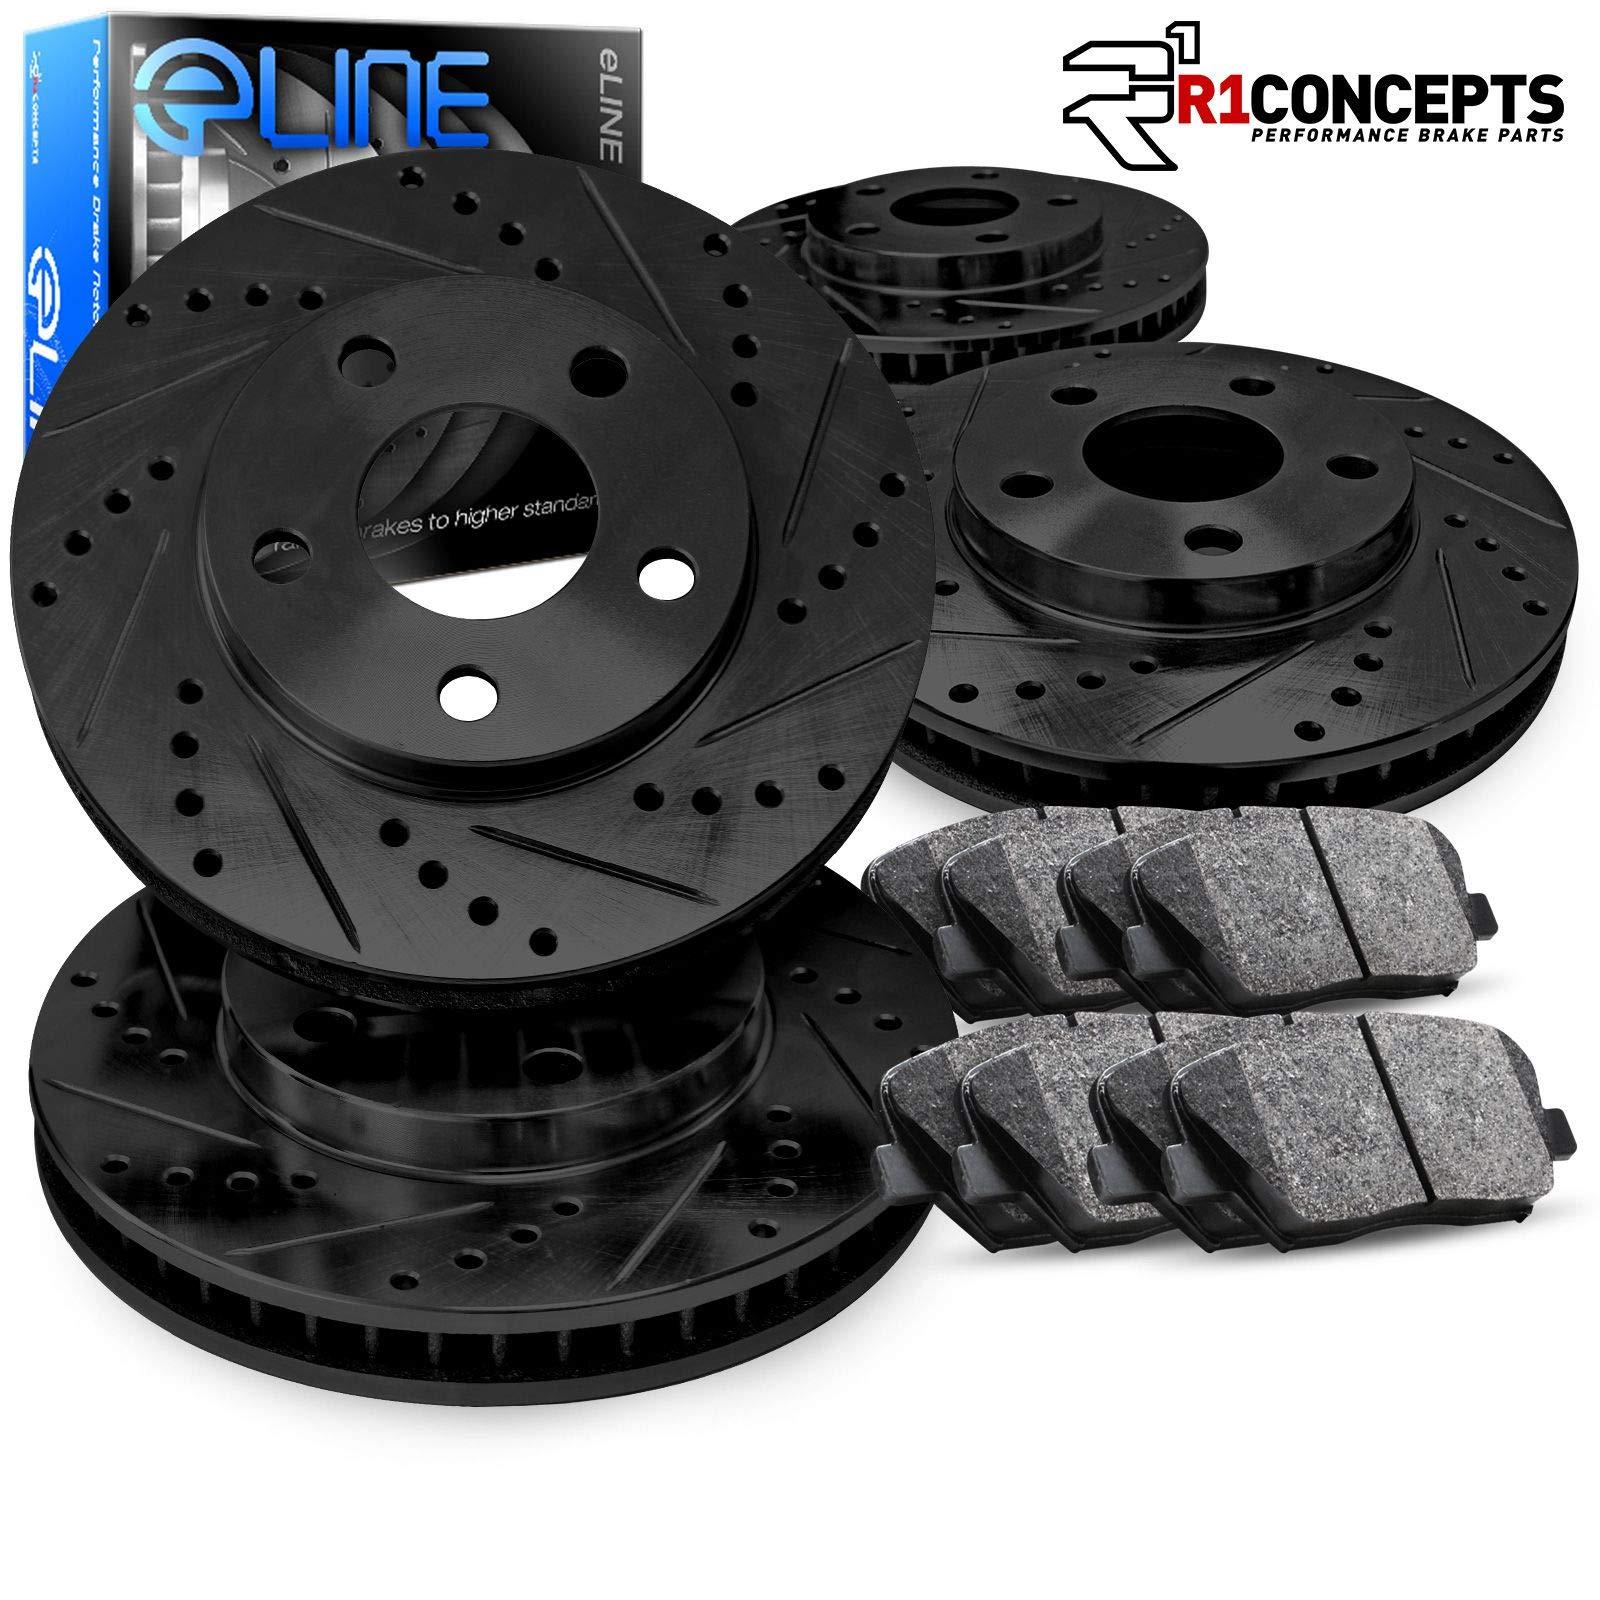 For 2013-2017 Honda Accord R1 Concepts eLine Front Rear Black Drill//Slot Brake Rotors Kit